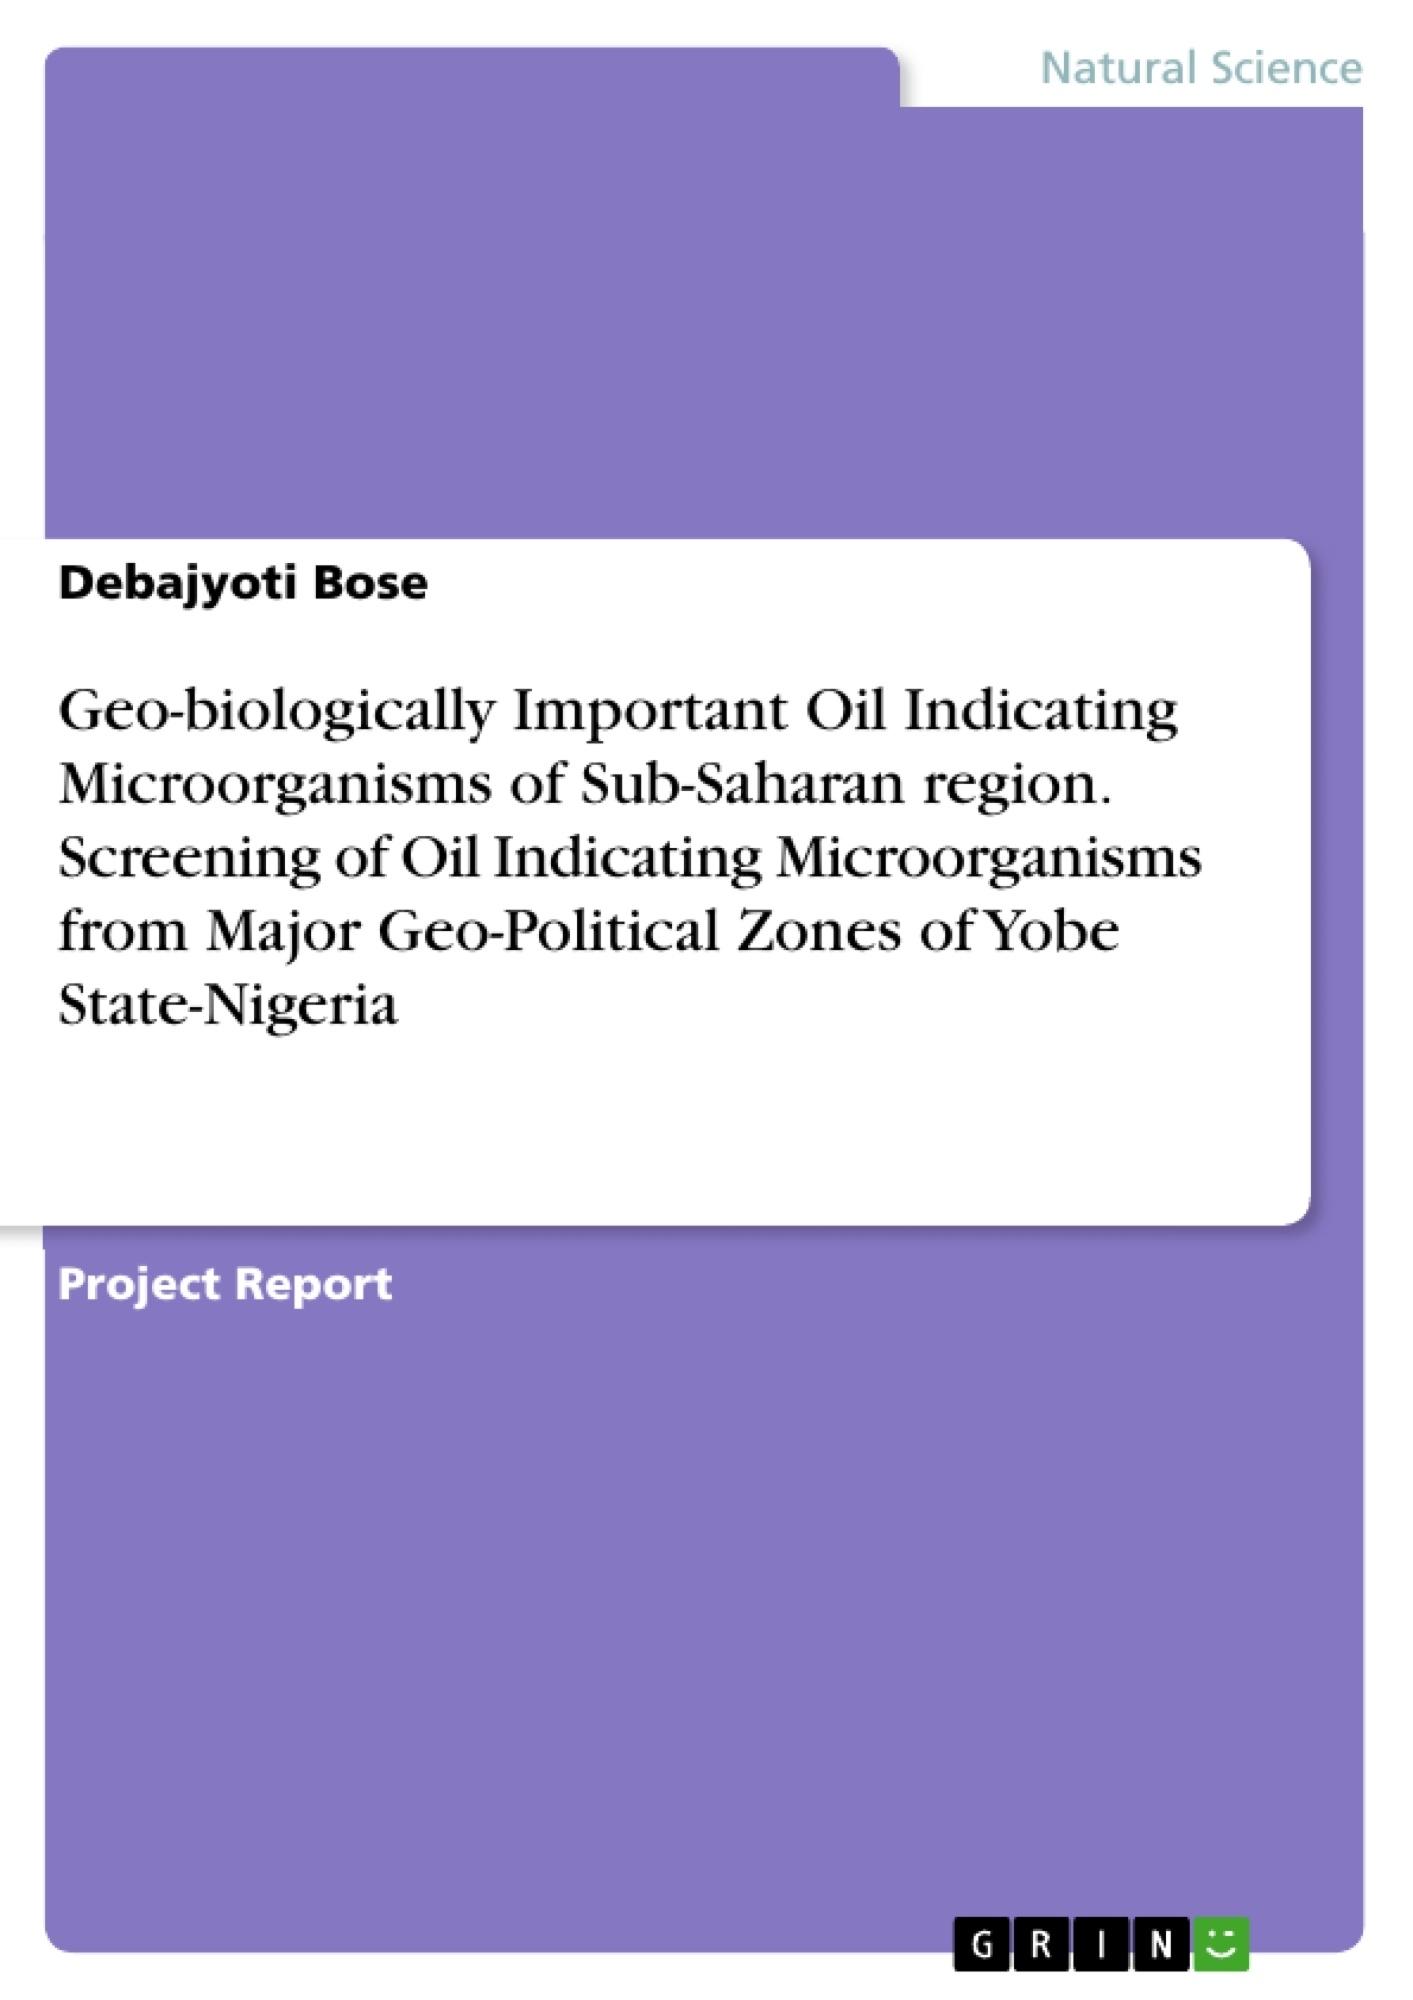 Title: Geo-biologically Important Oil Indicating Microorganisms of Sub-Saharan region. Screening of Oil Indicating Microorganisms from Major Geo-Political Zones of Yobe State-Nigeria